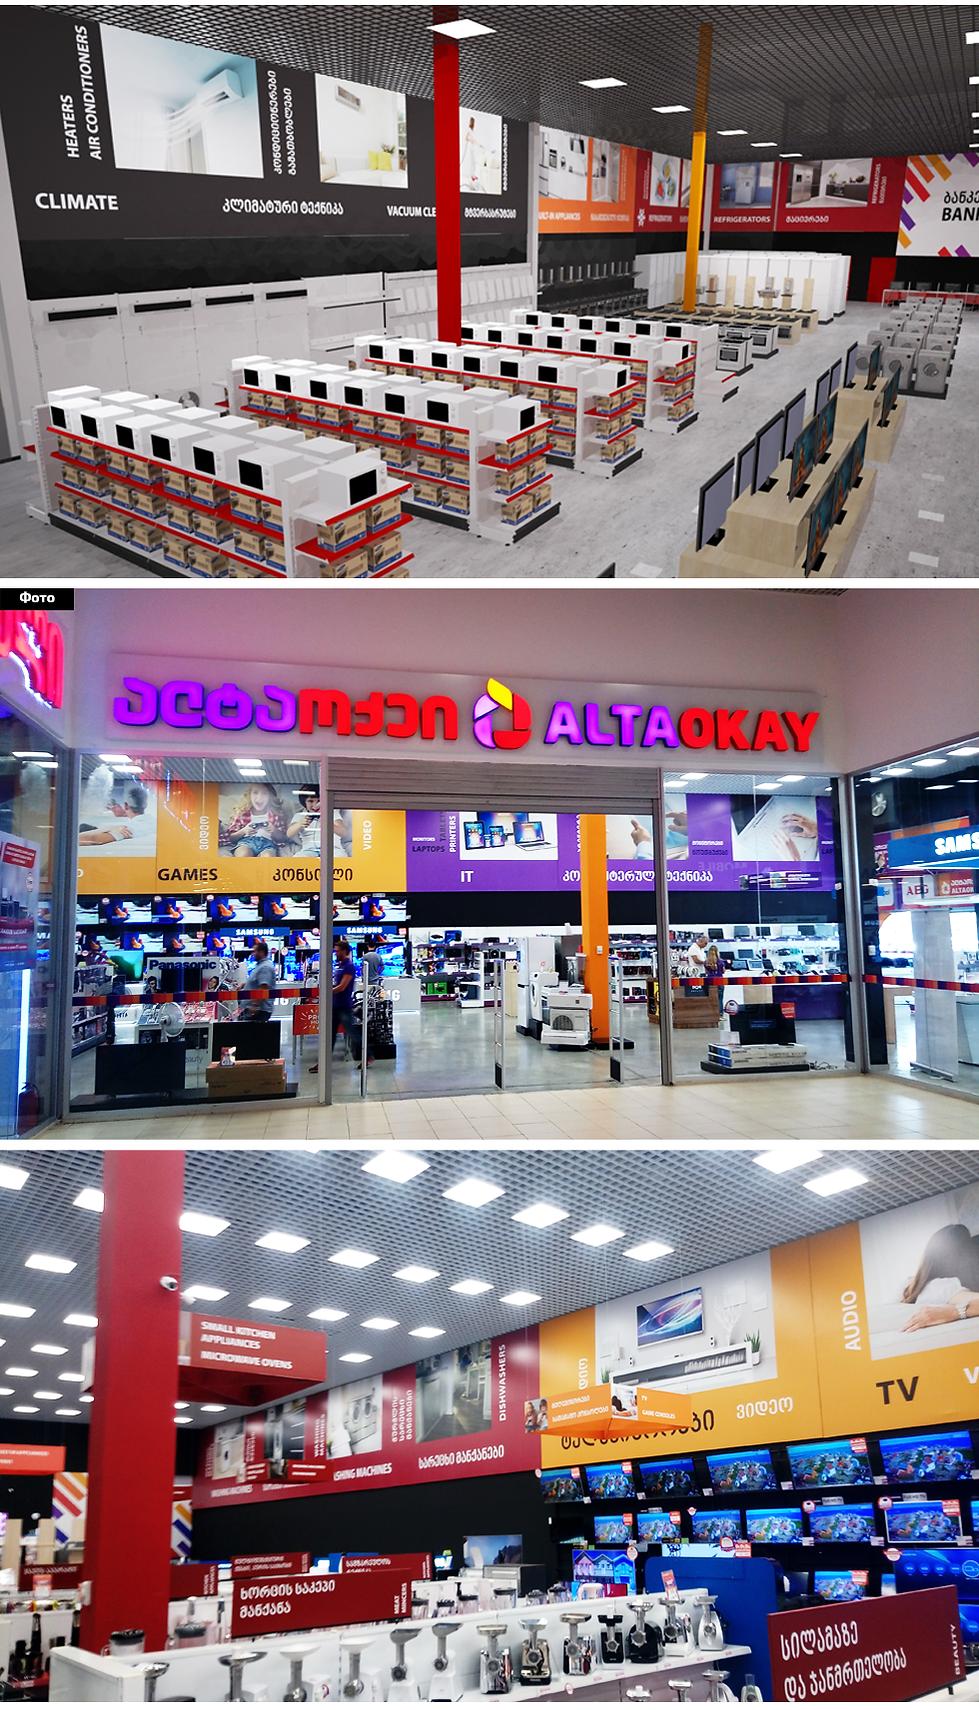 altaokay design